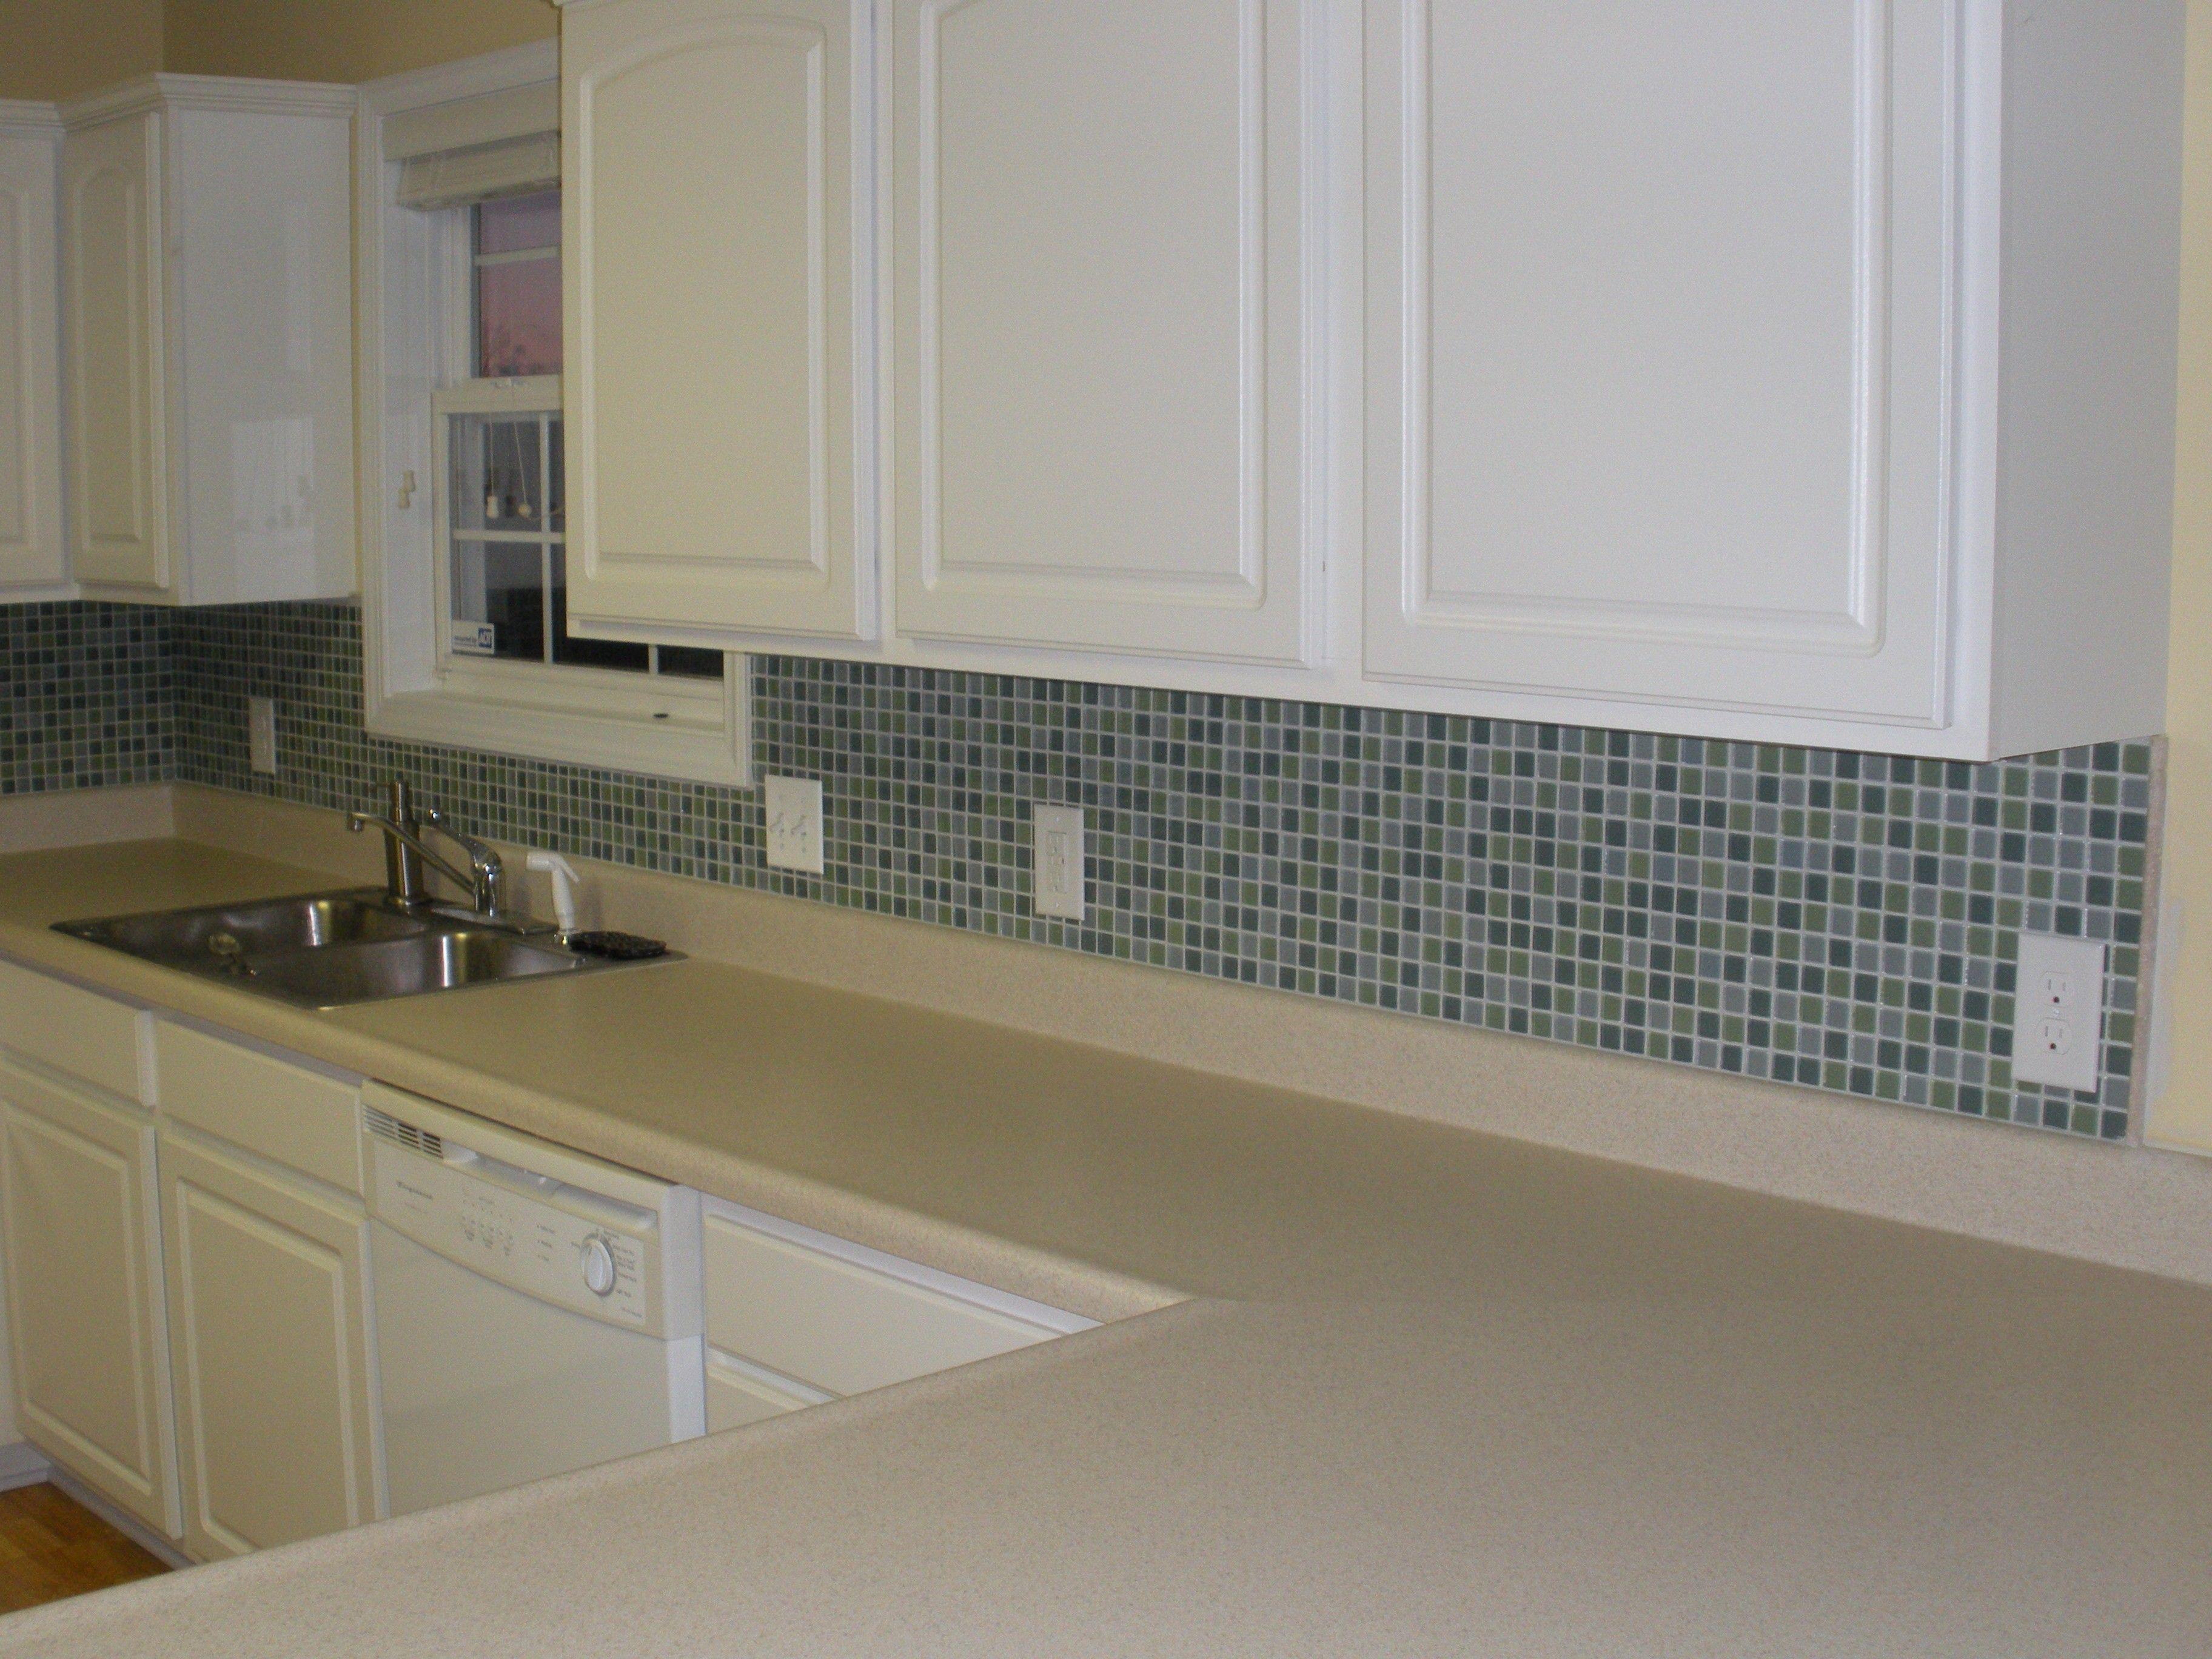 Mosaic tile bathroom backsplash ideas google search